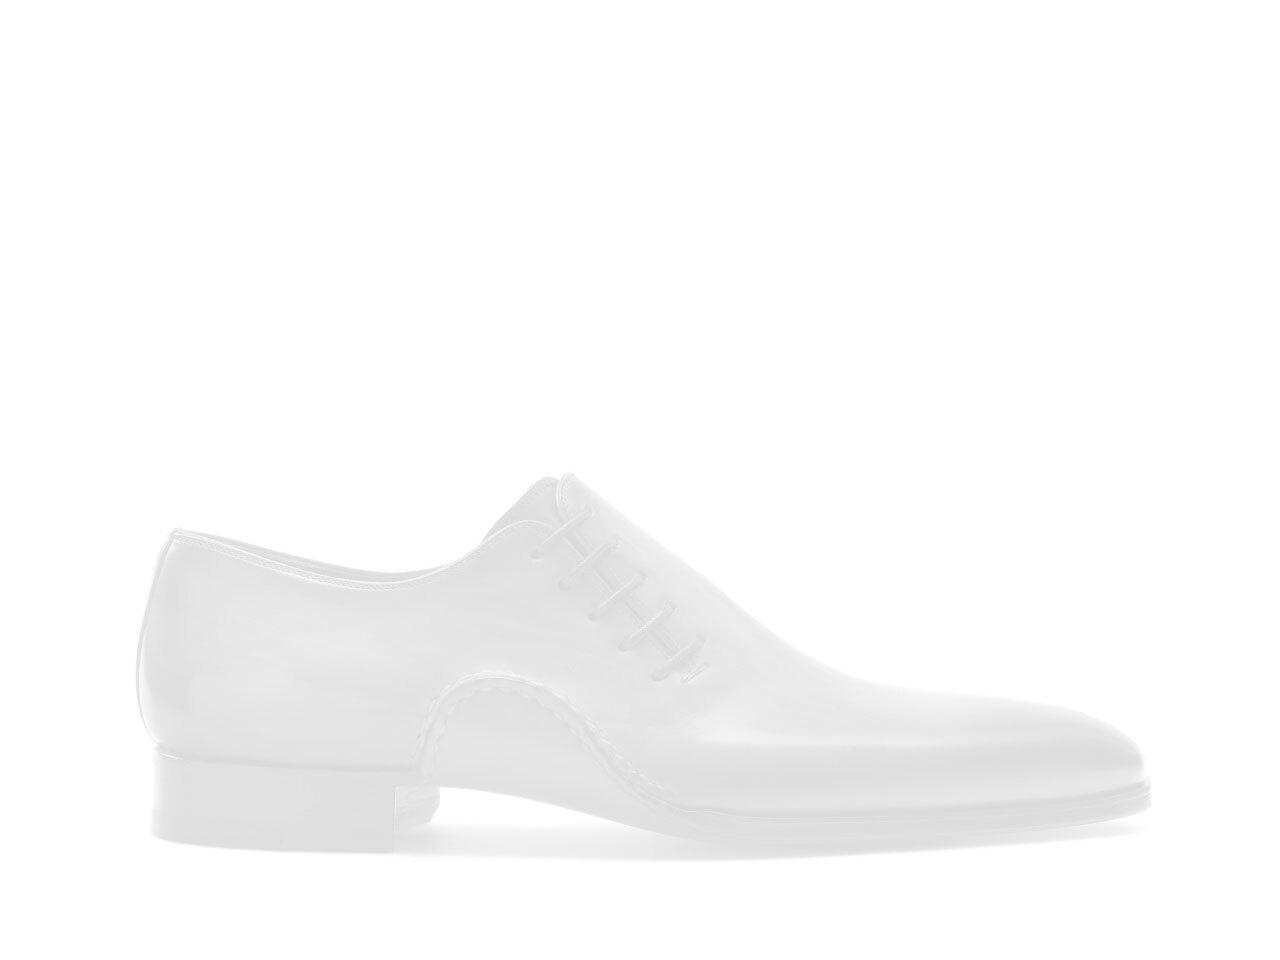 Side view of the Magnanni Garrett Black Men's Double Monk Strap Shoes